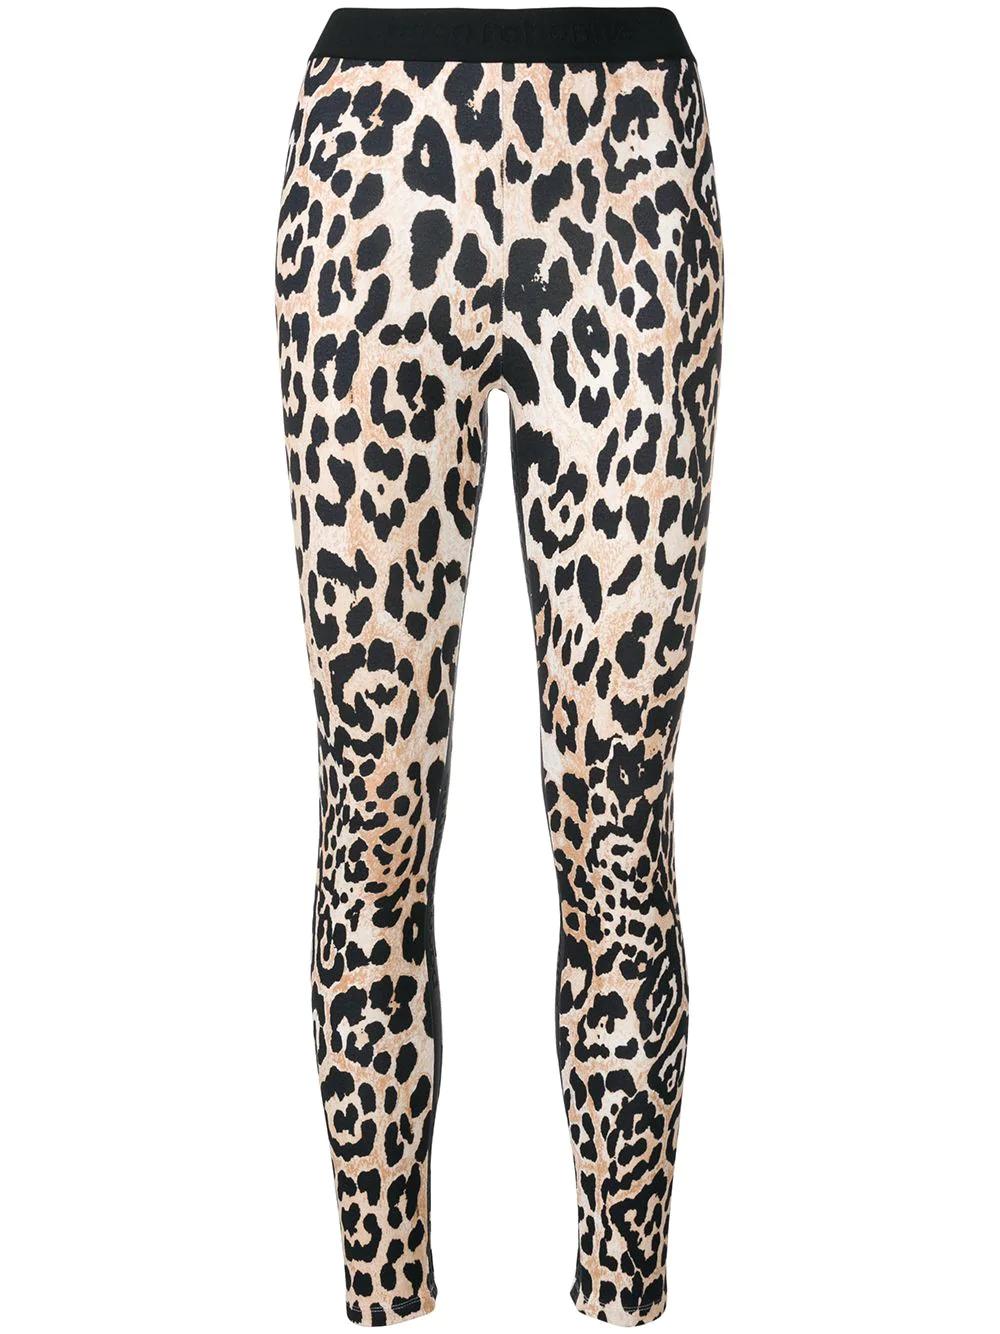 b11a6a285056b Paco Rabanne - Leopard Print Stretch Leggings - Womens - Leopard In Brown